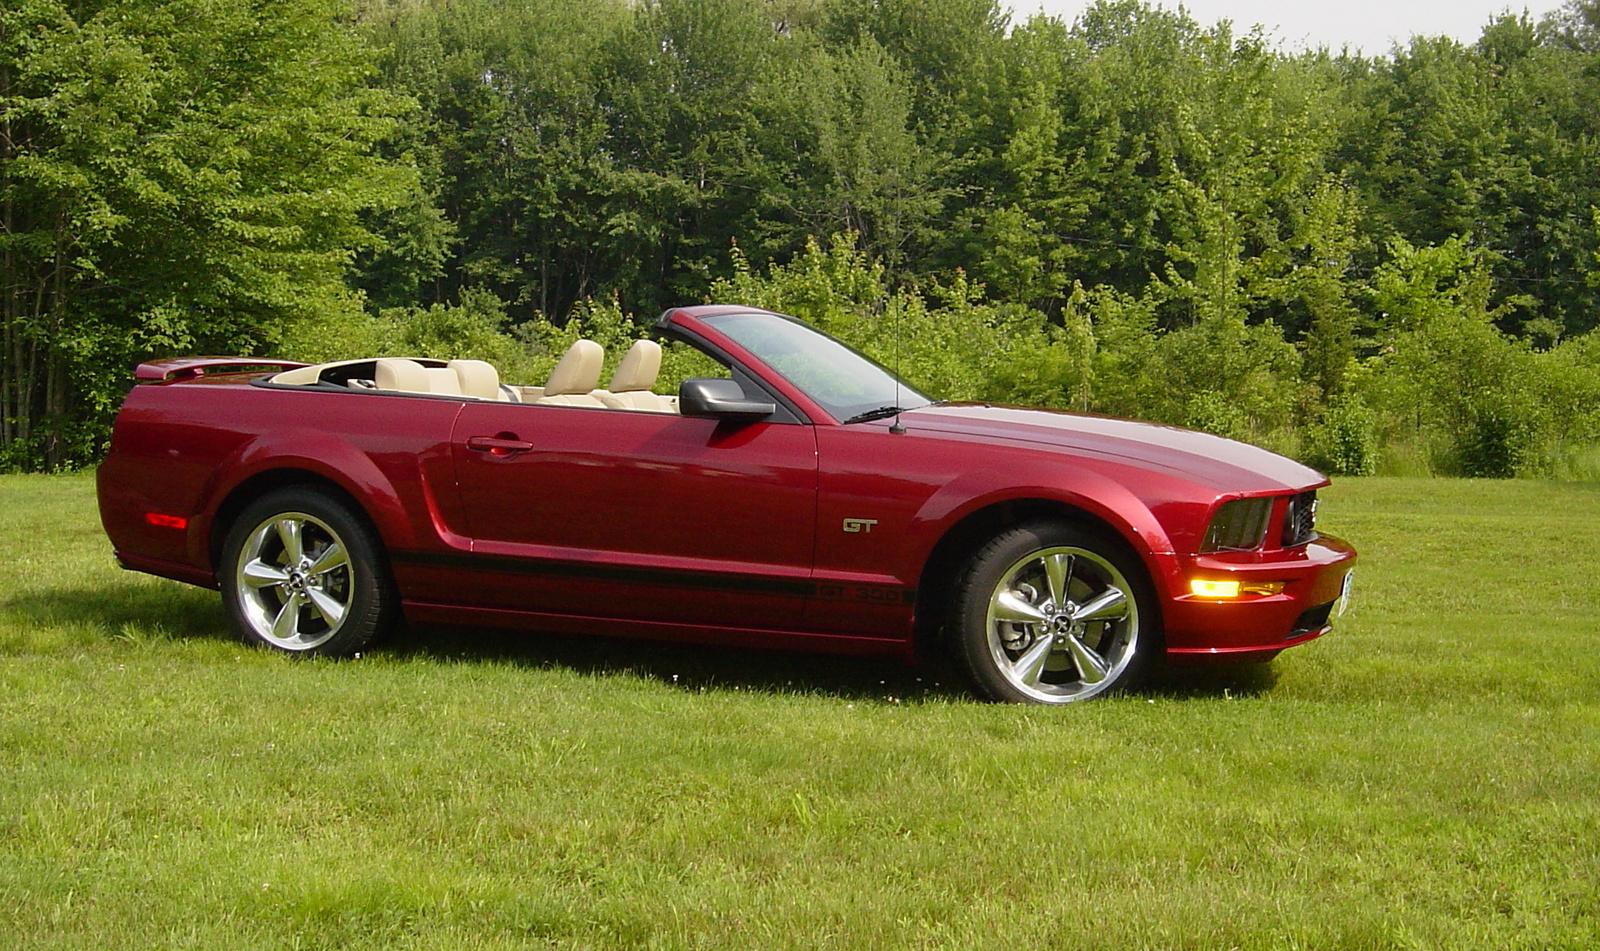 2006 Mustang Gt Specs | Top Car Reviews 2019 2020